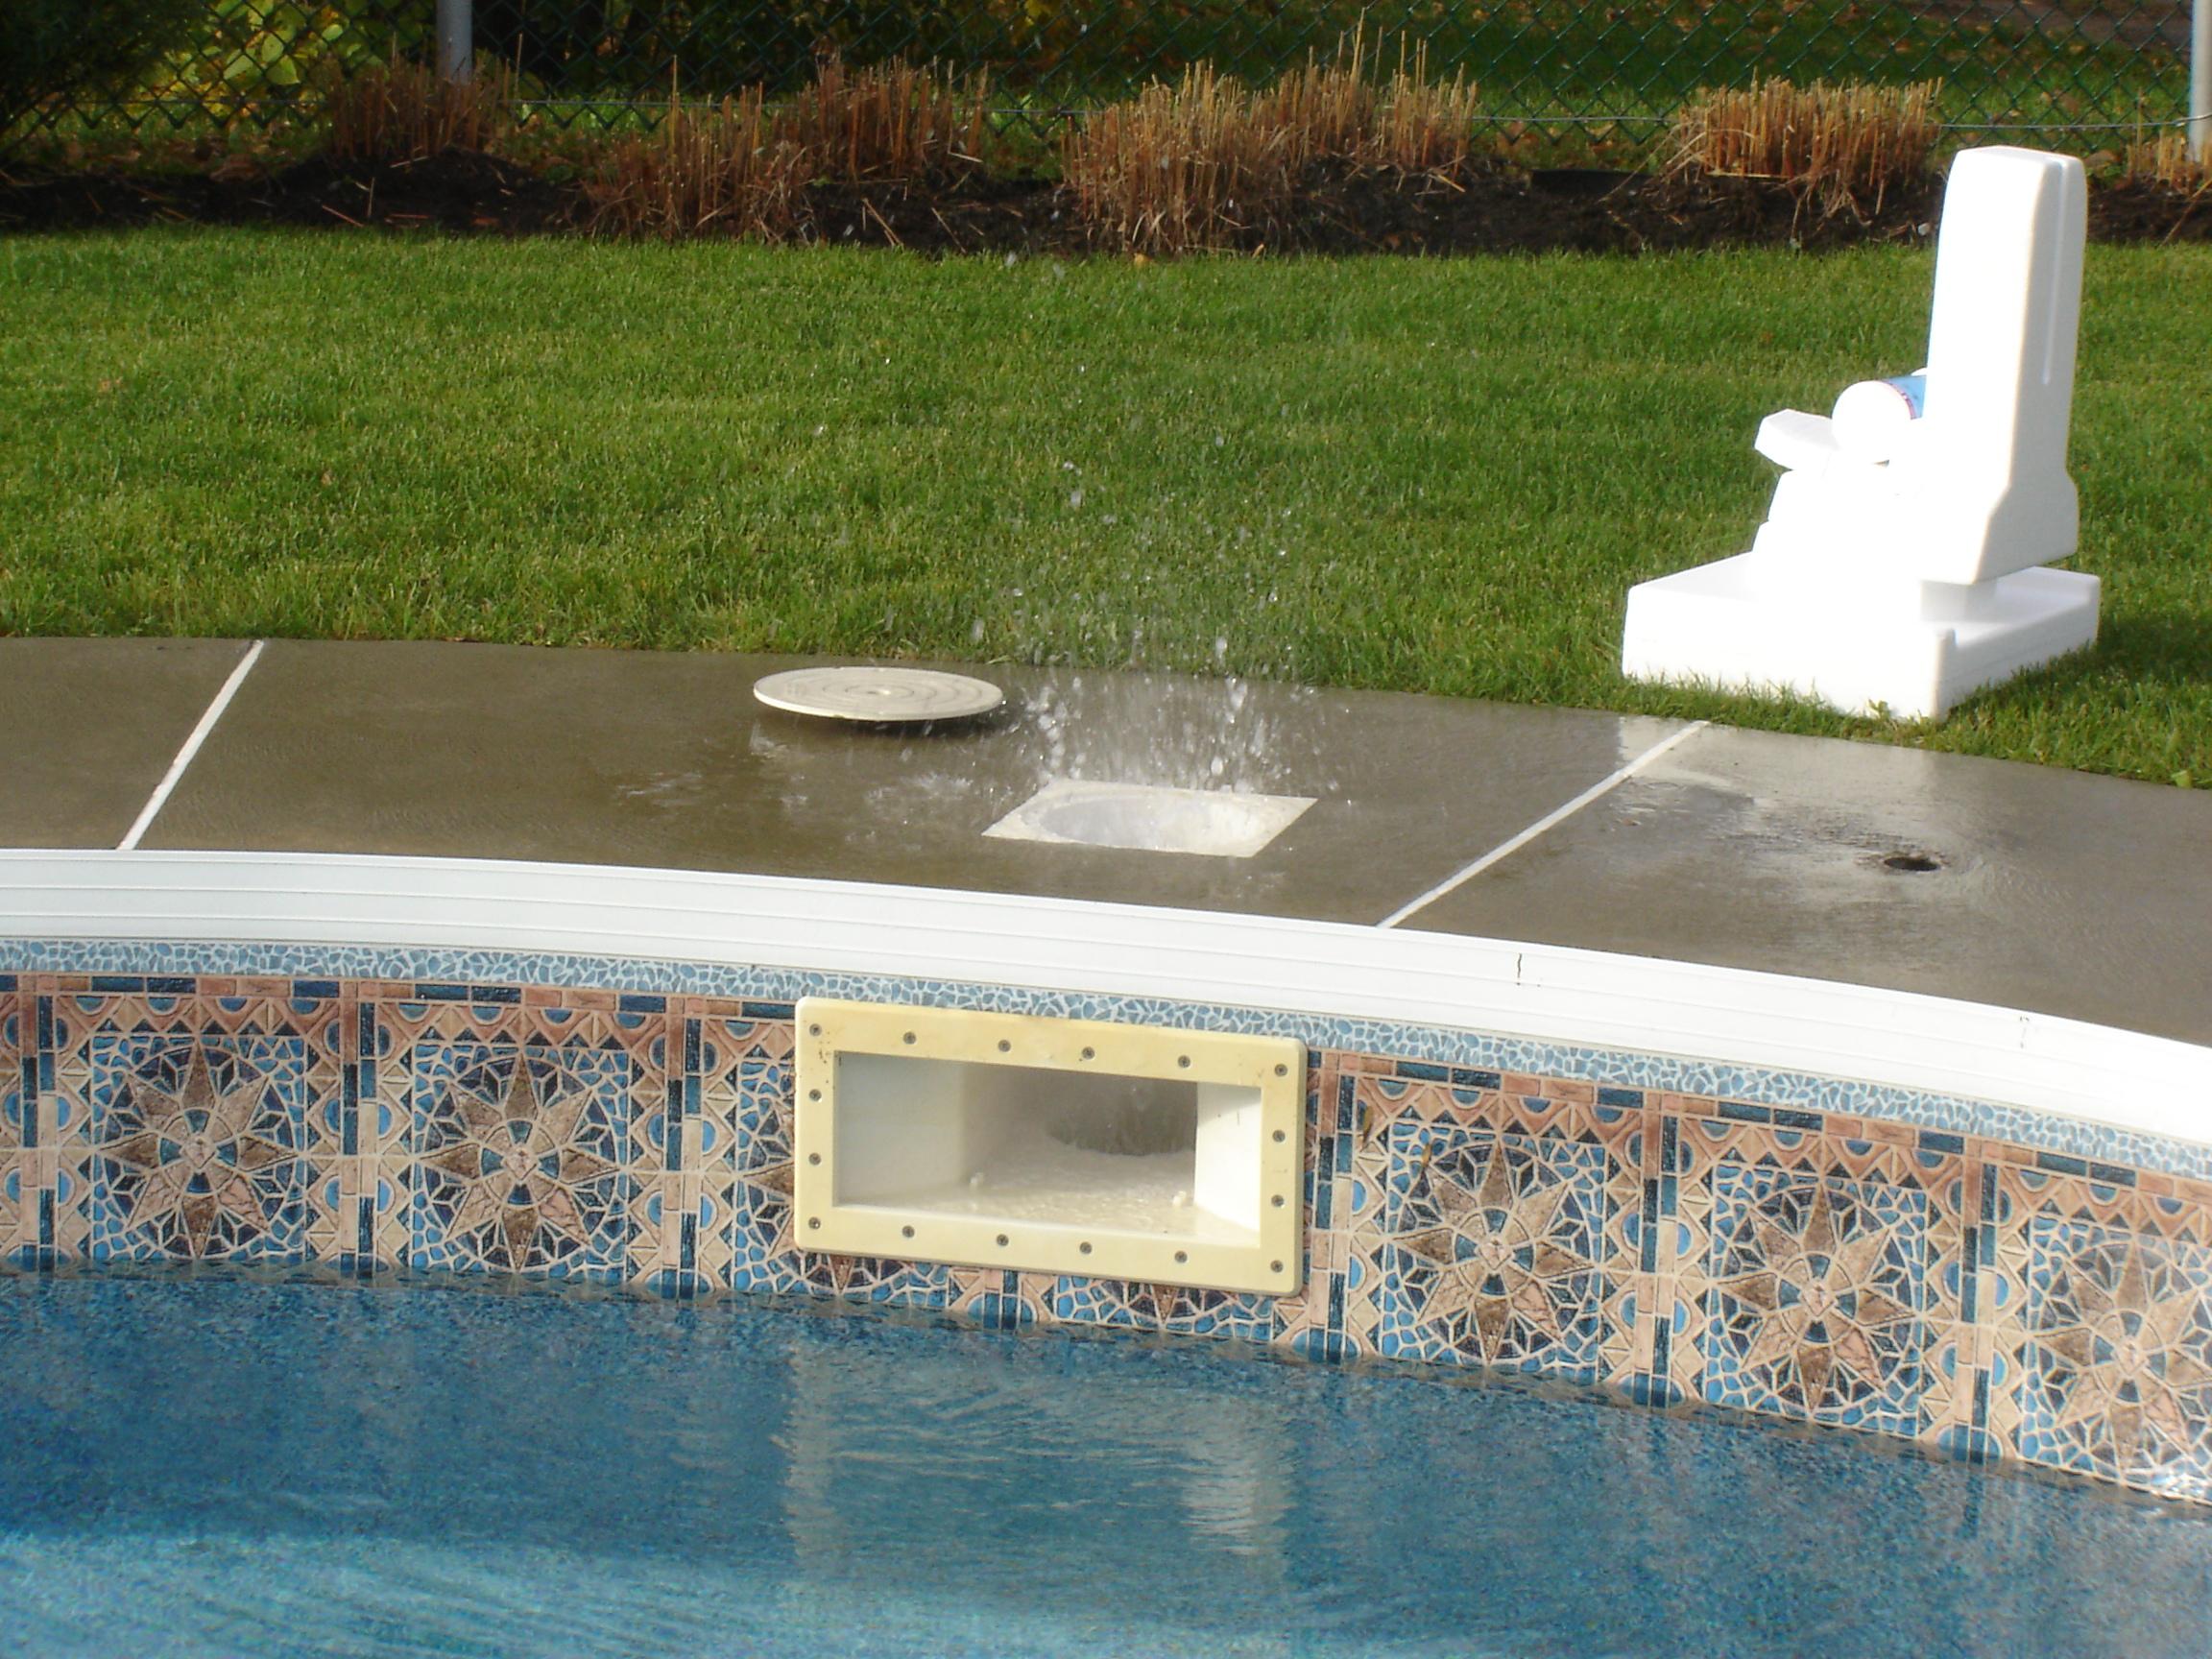 Fermeture de piscine poseidon montr al rive sud longueuil for Club piscine rive sud montreal